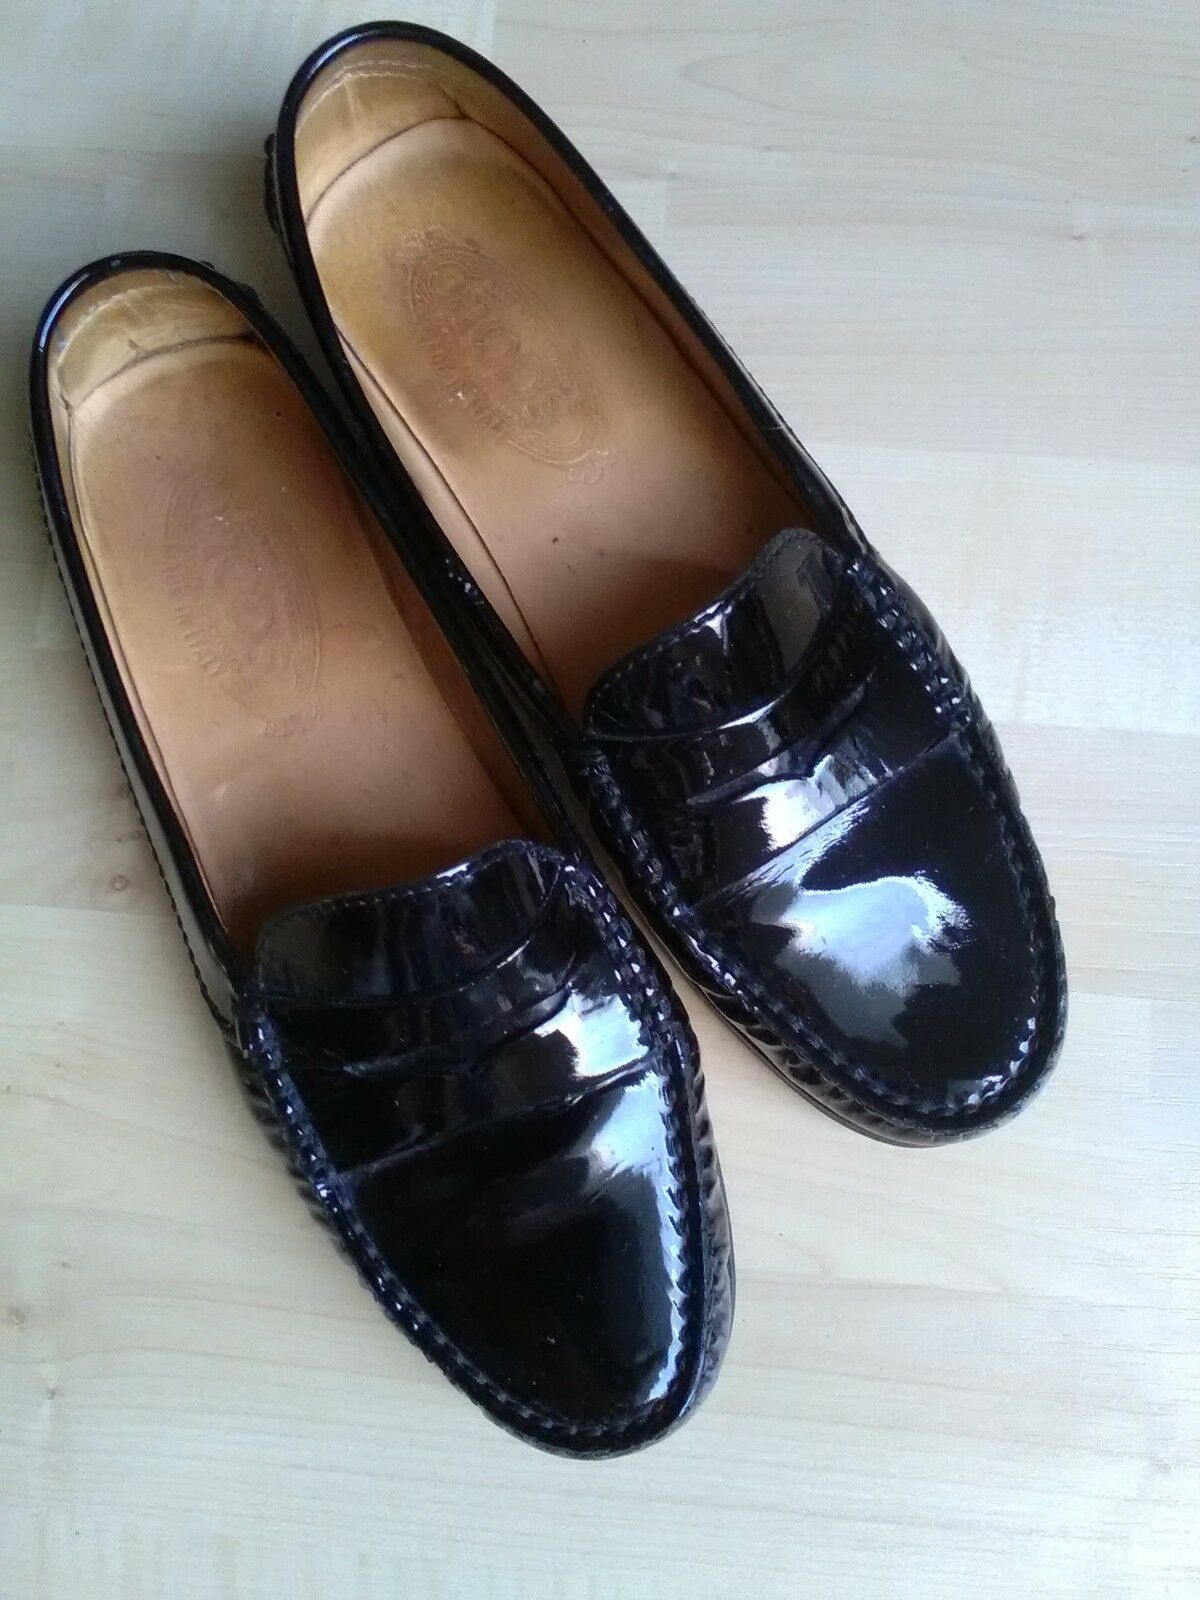 Tods Schuhe Lack Schuhe Tods Gr 39 in schwarz d7eb71